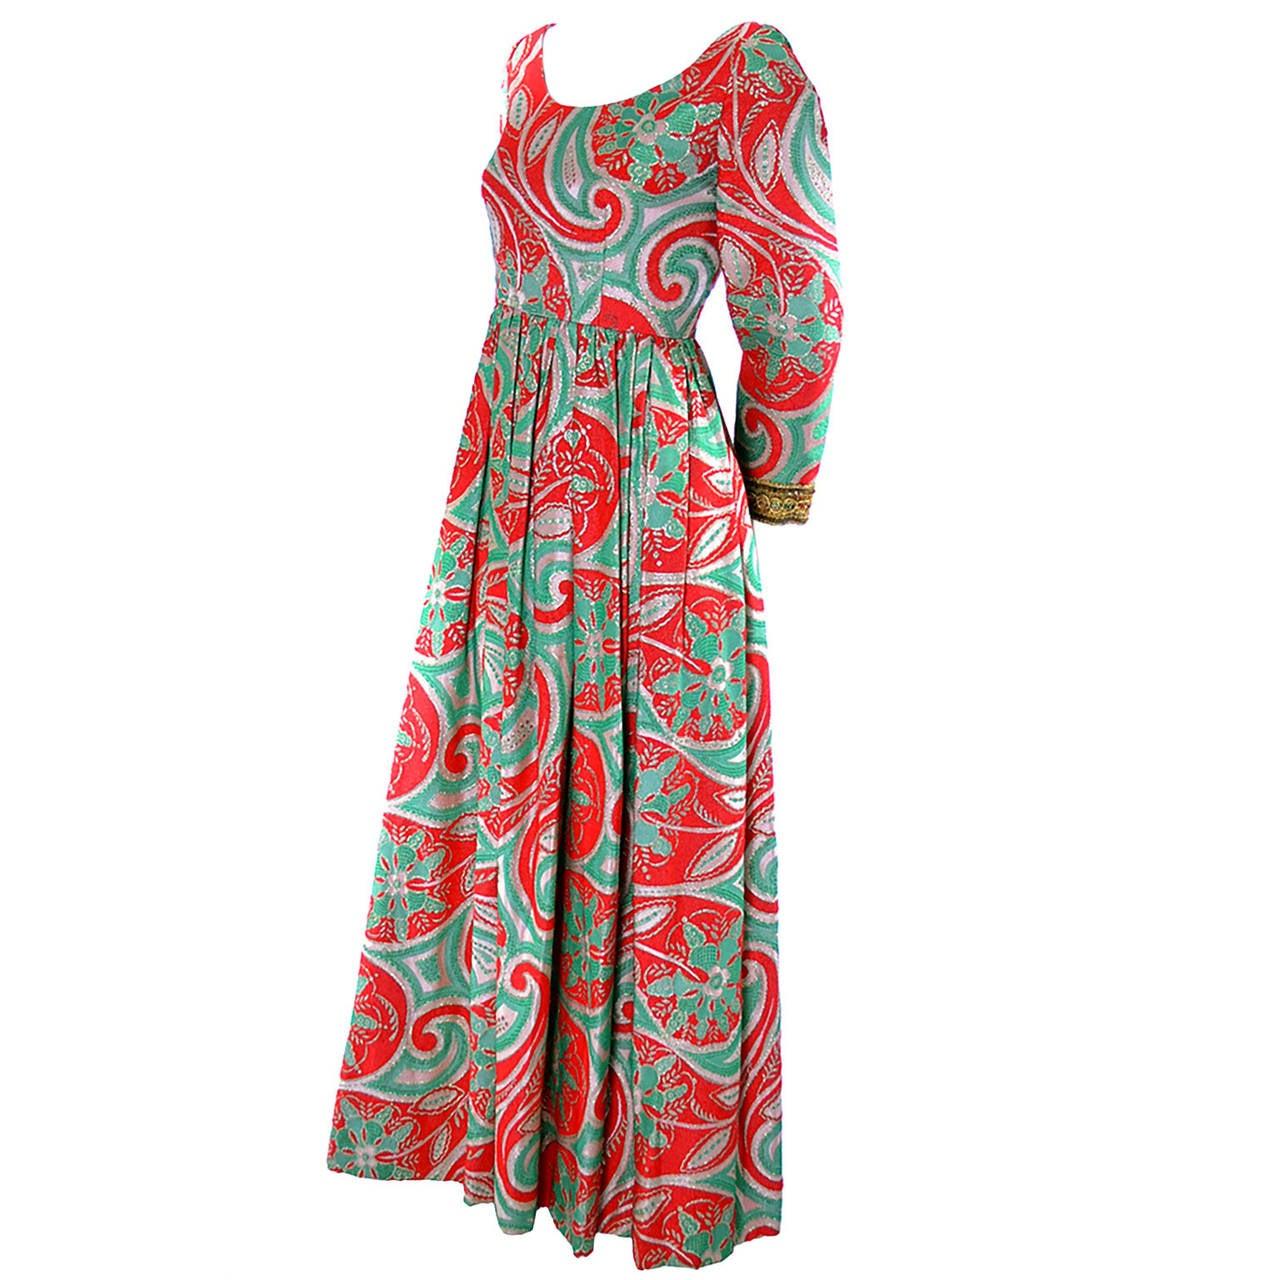 Oscar de la Renta Dress Boutique Vintage Dress 1960s Metallic Paisley Maxi